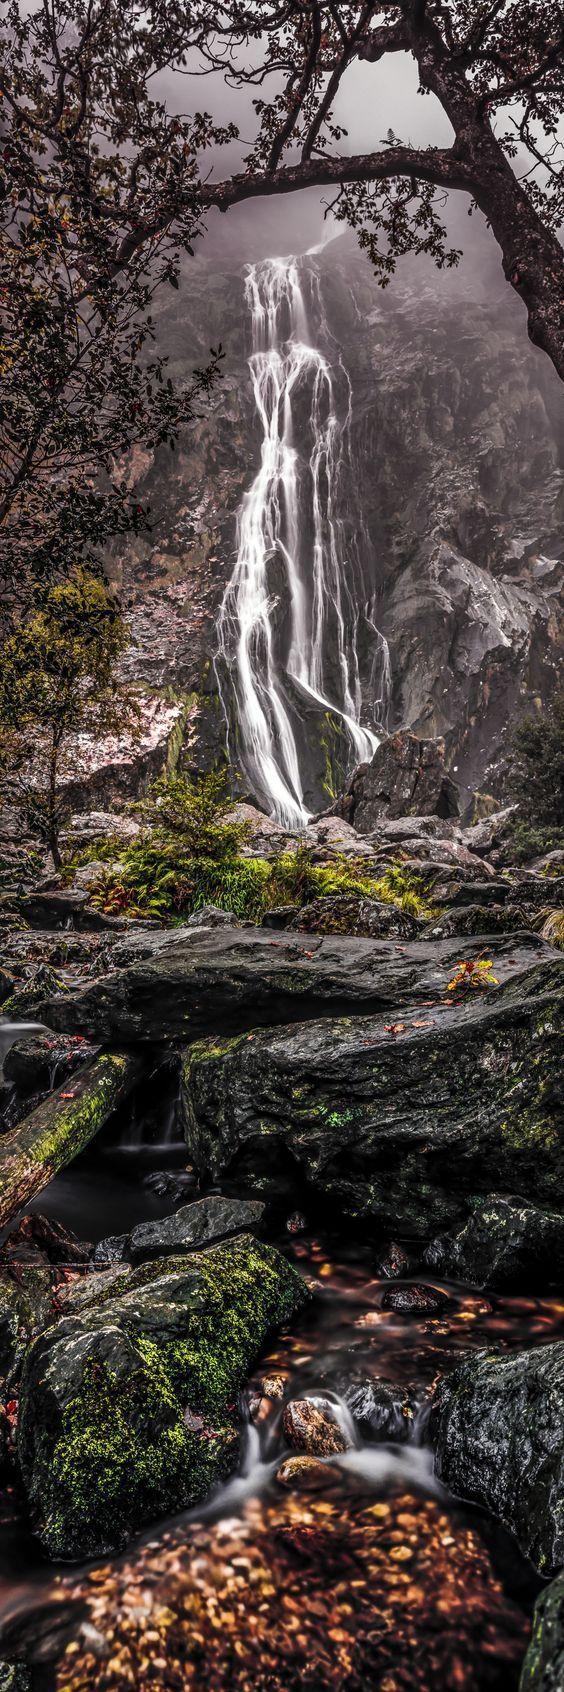 At the Powerscourt Waterfall in Wicklow, Ireland.